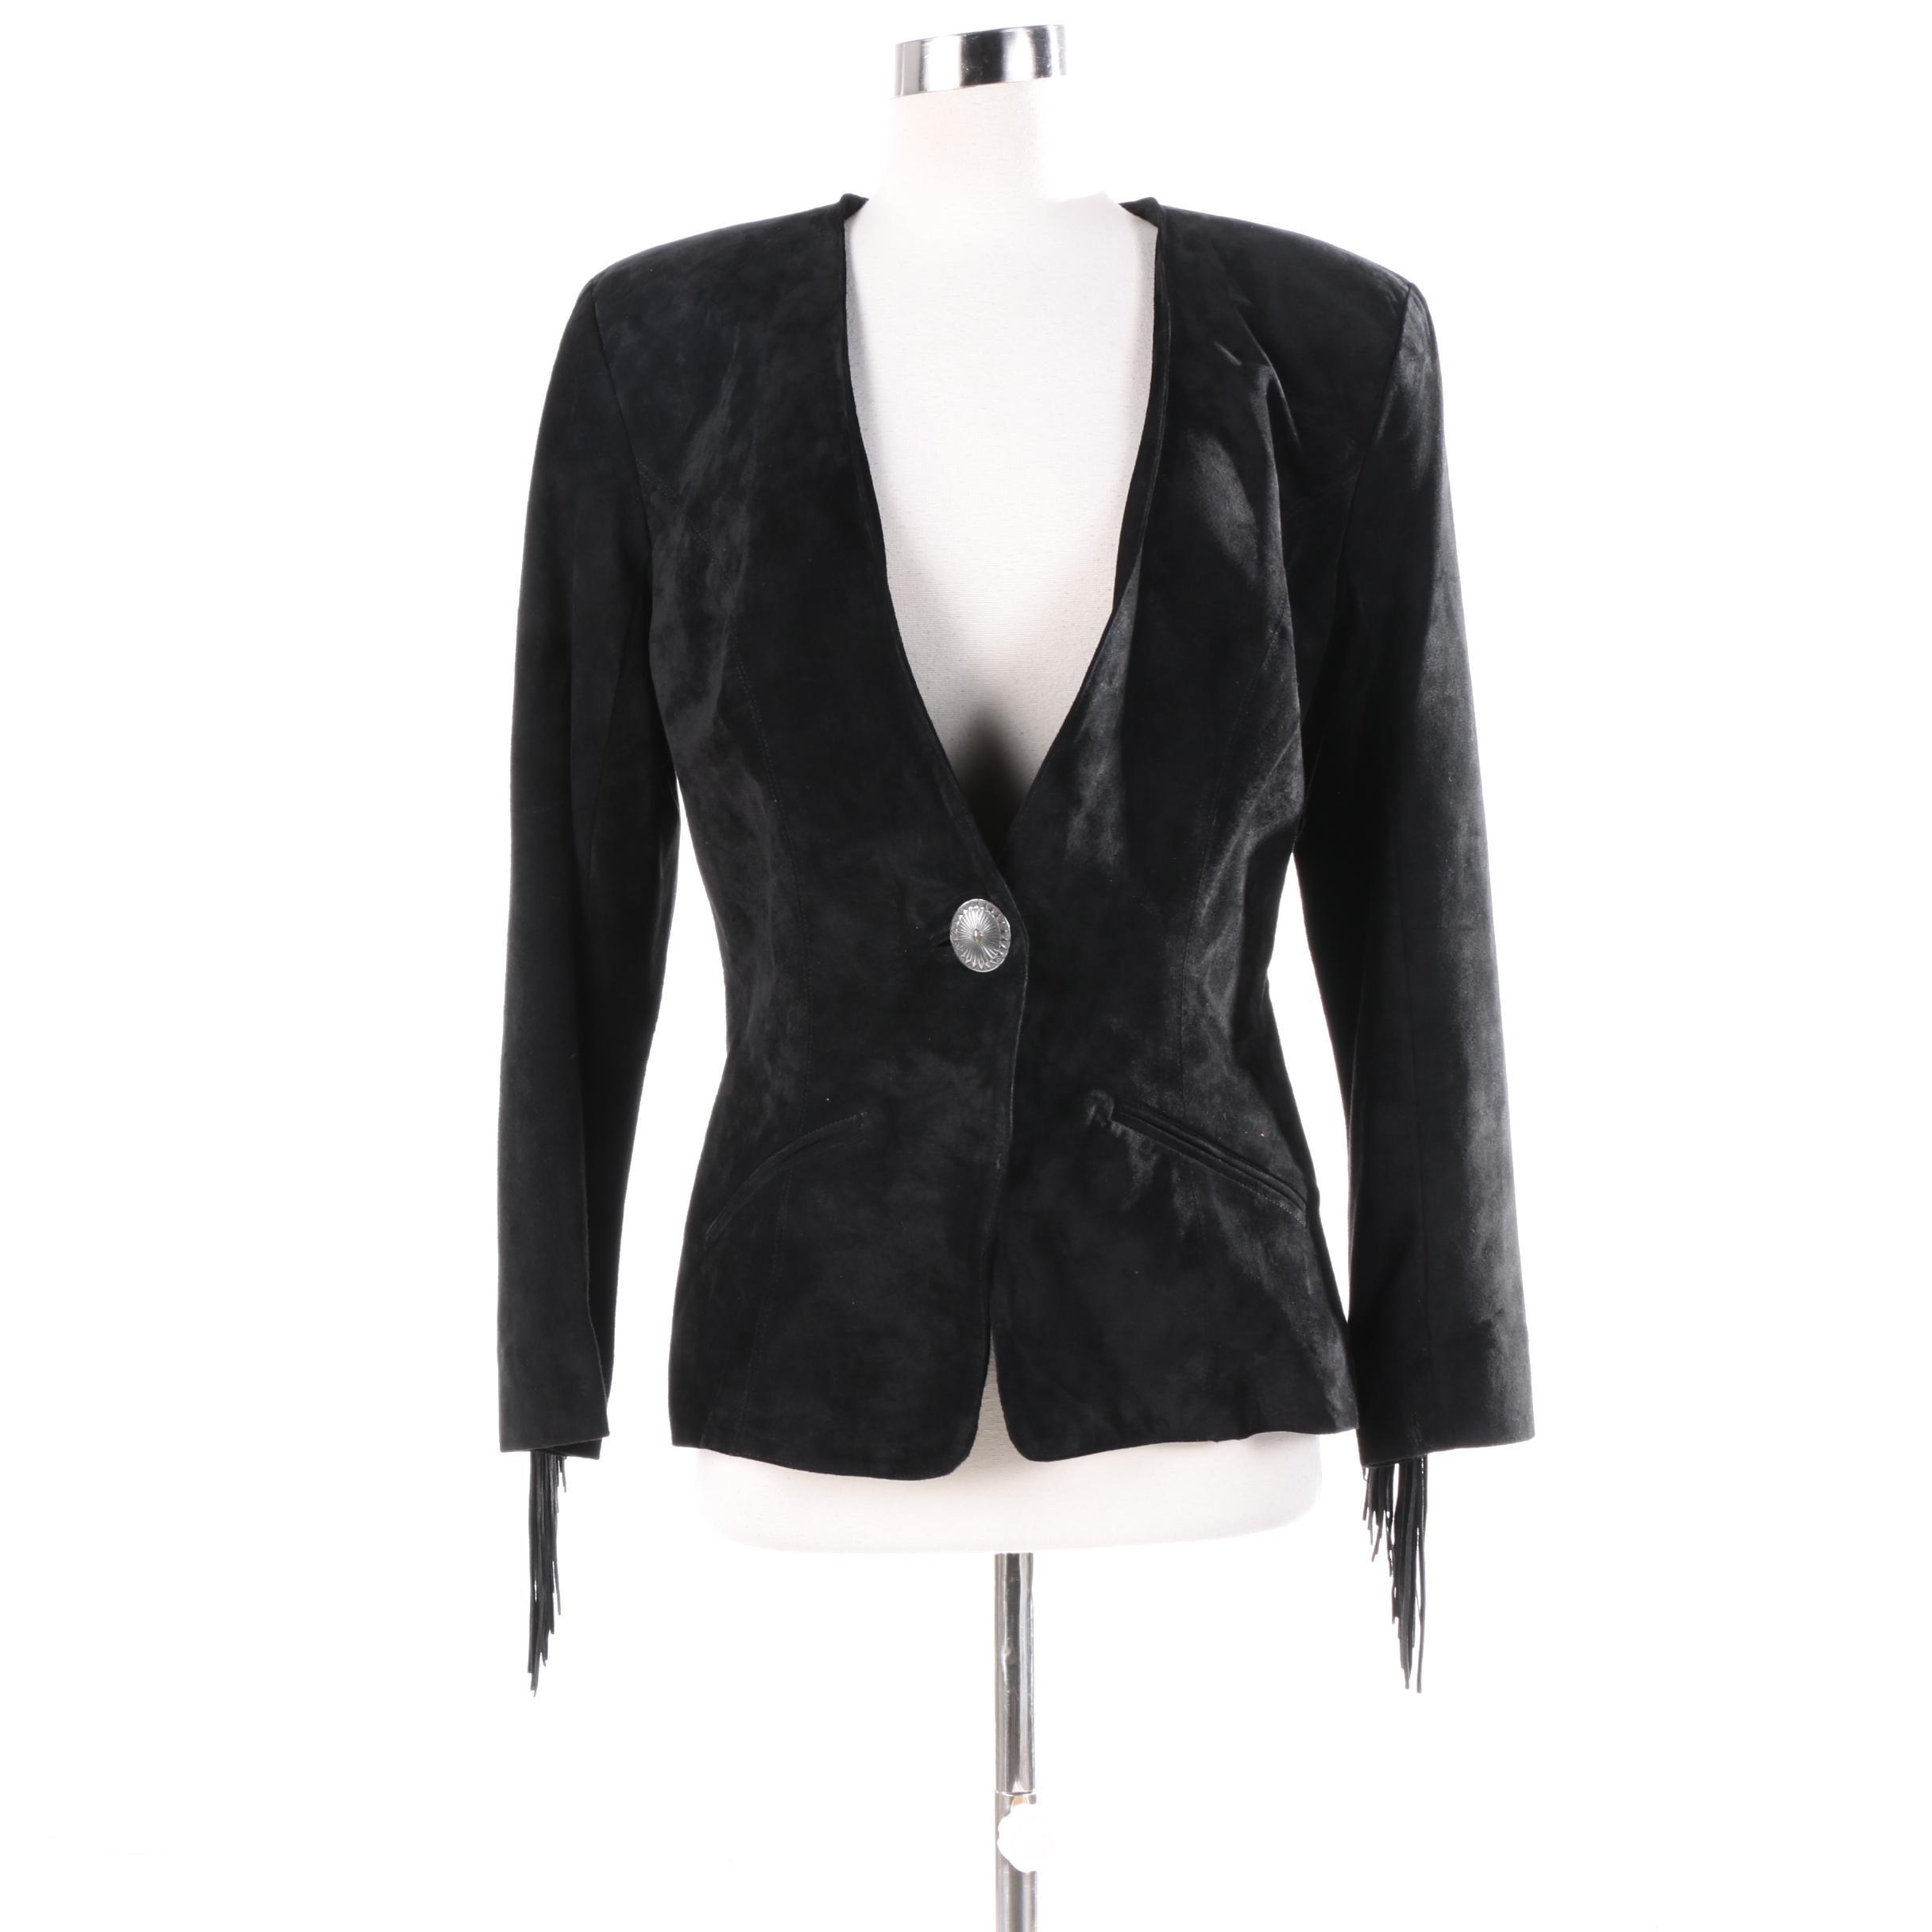 Women's S.H.E. Apparel Black Suede Fringe Jacket